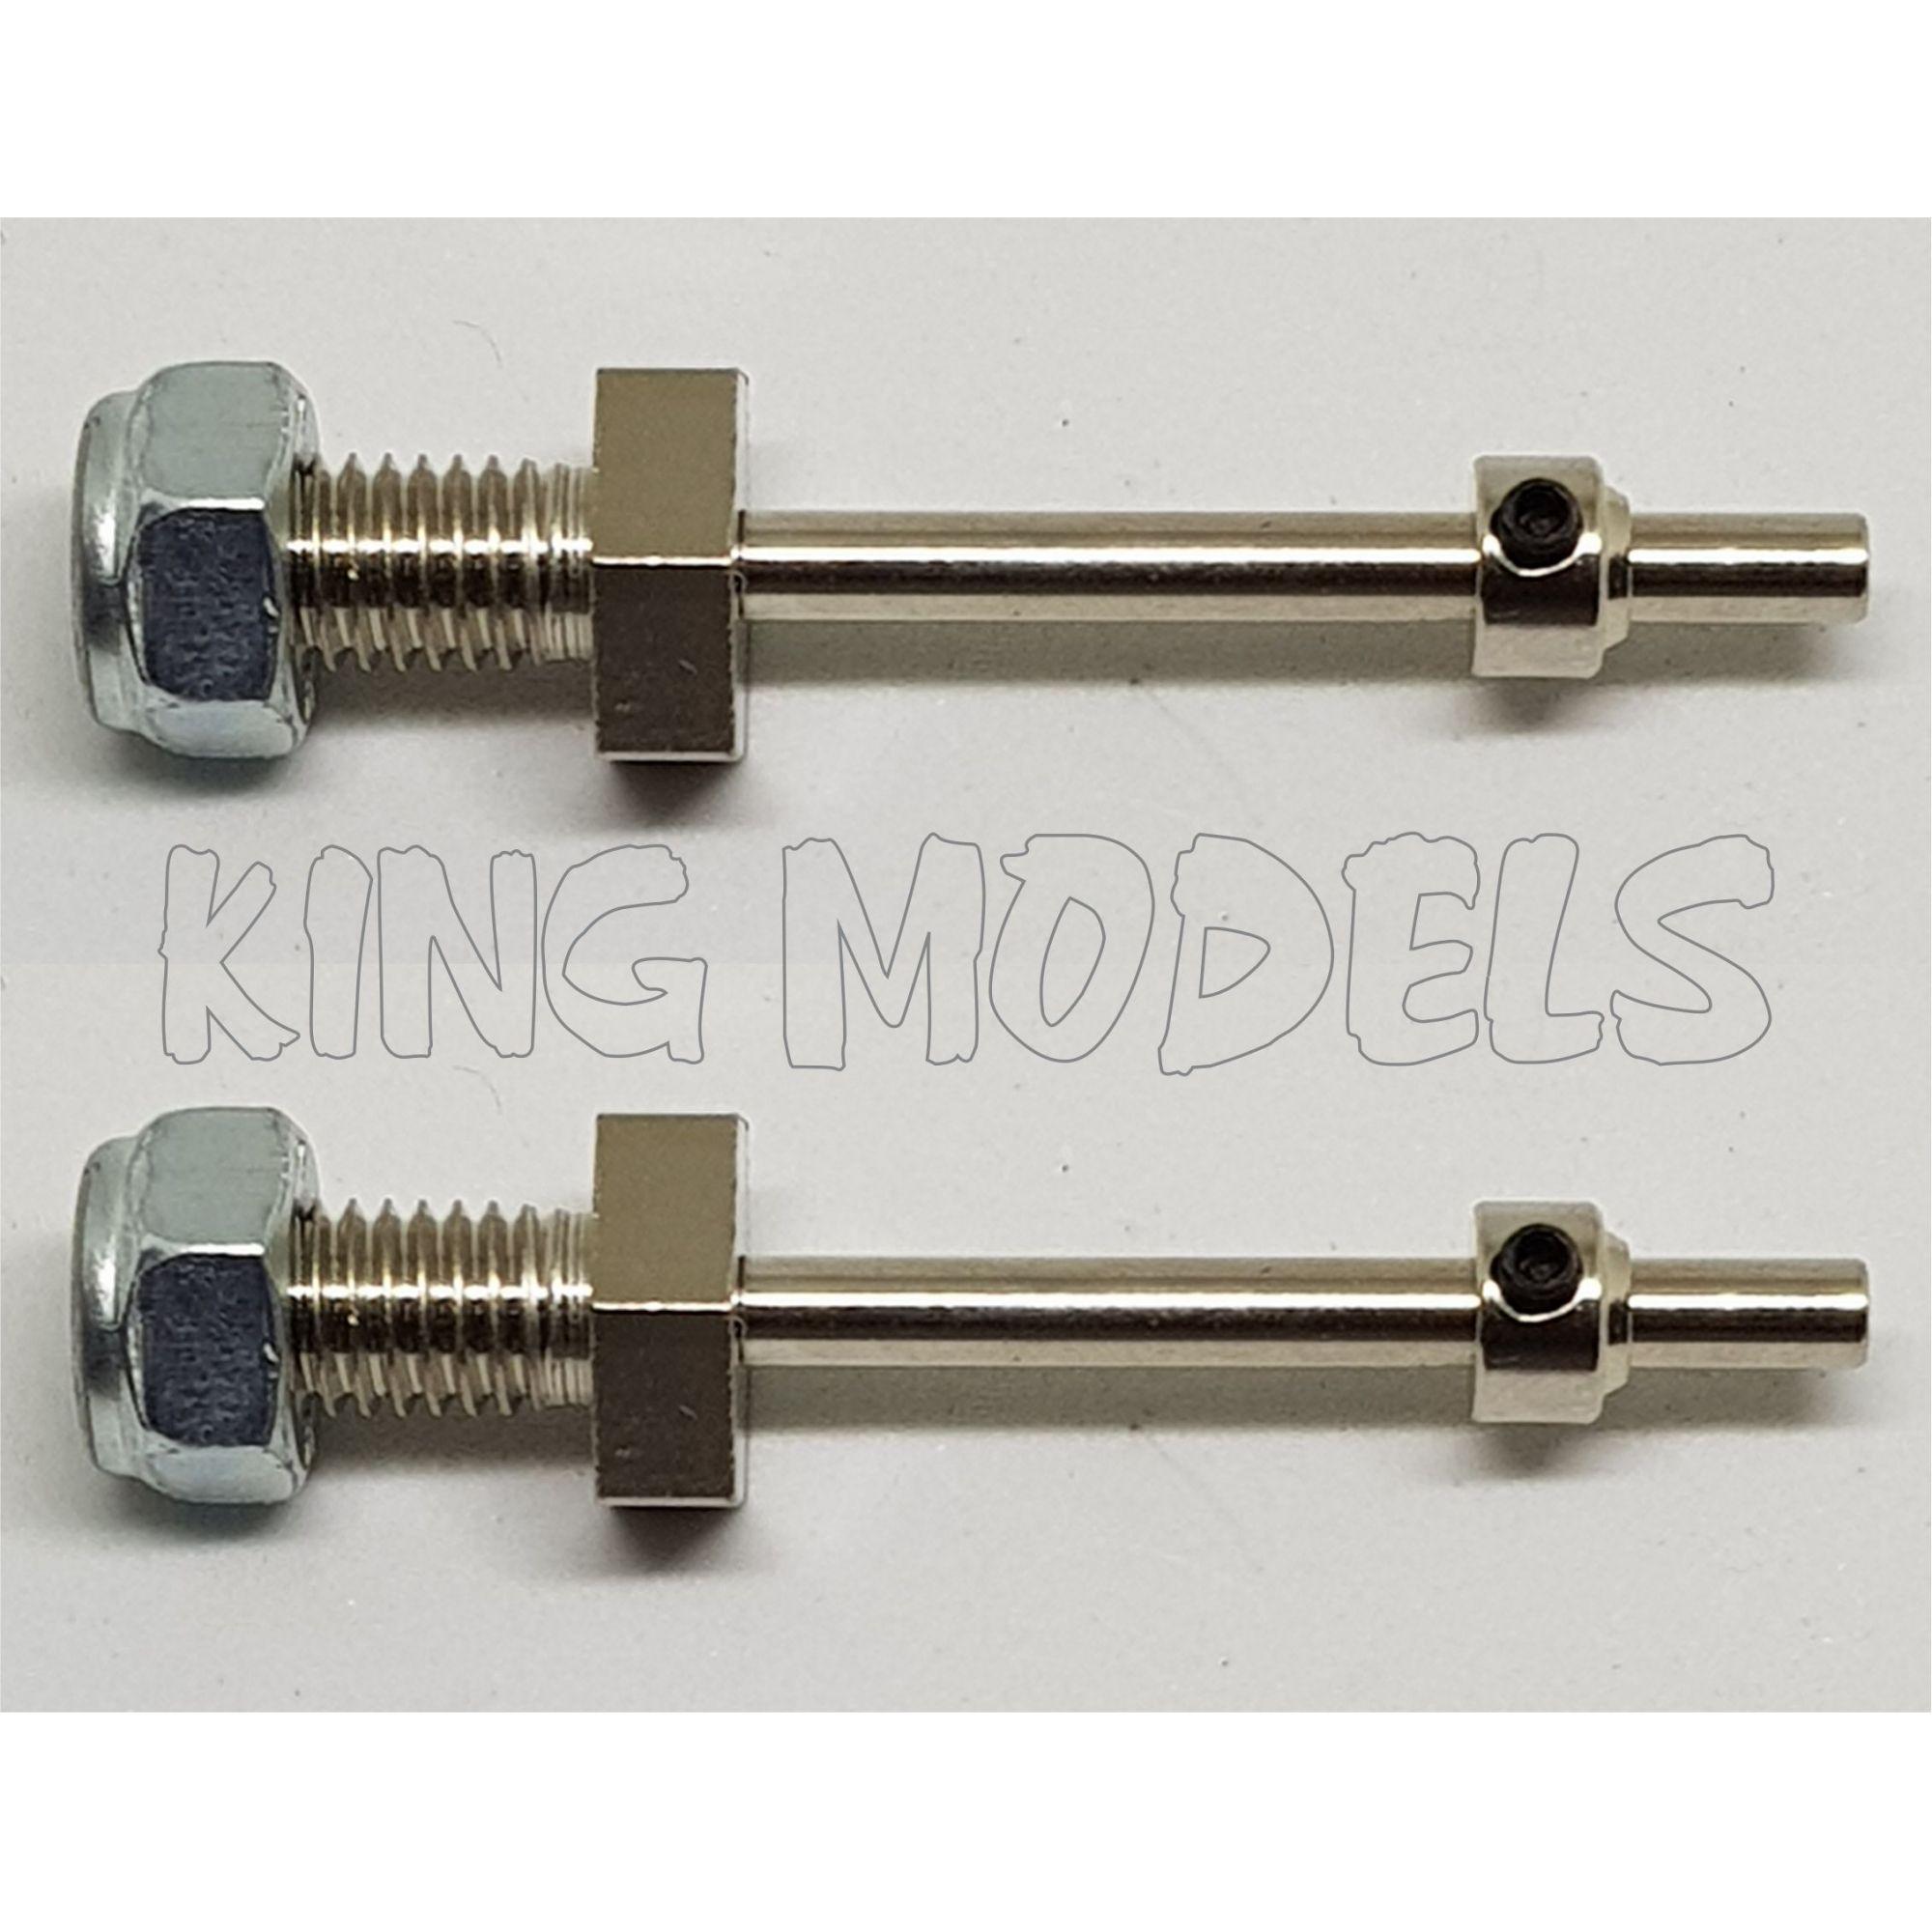 Conjunto De Eixo Para Trem De Pouso E Retentores - 4mmx40mm  - King Models